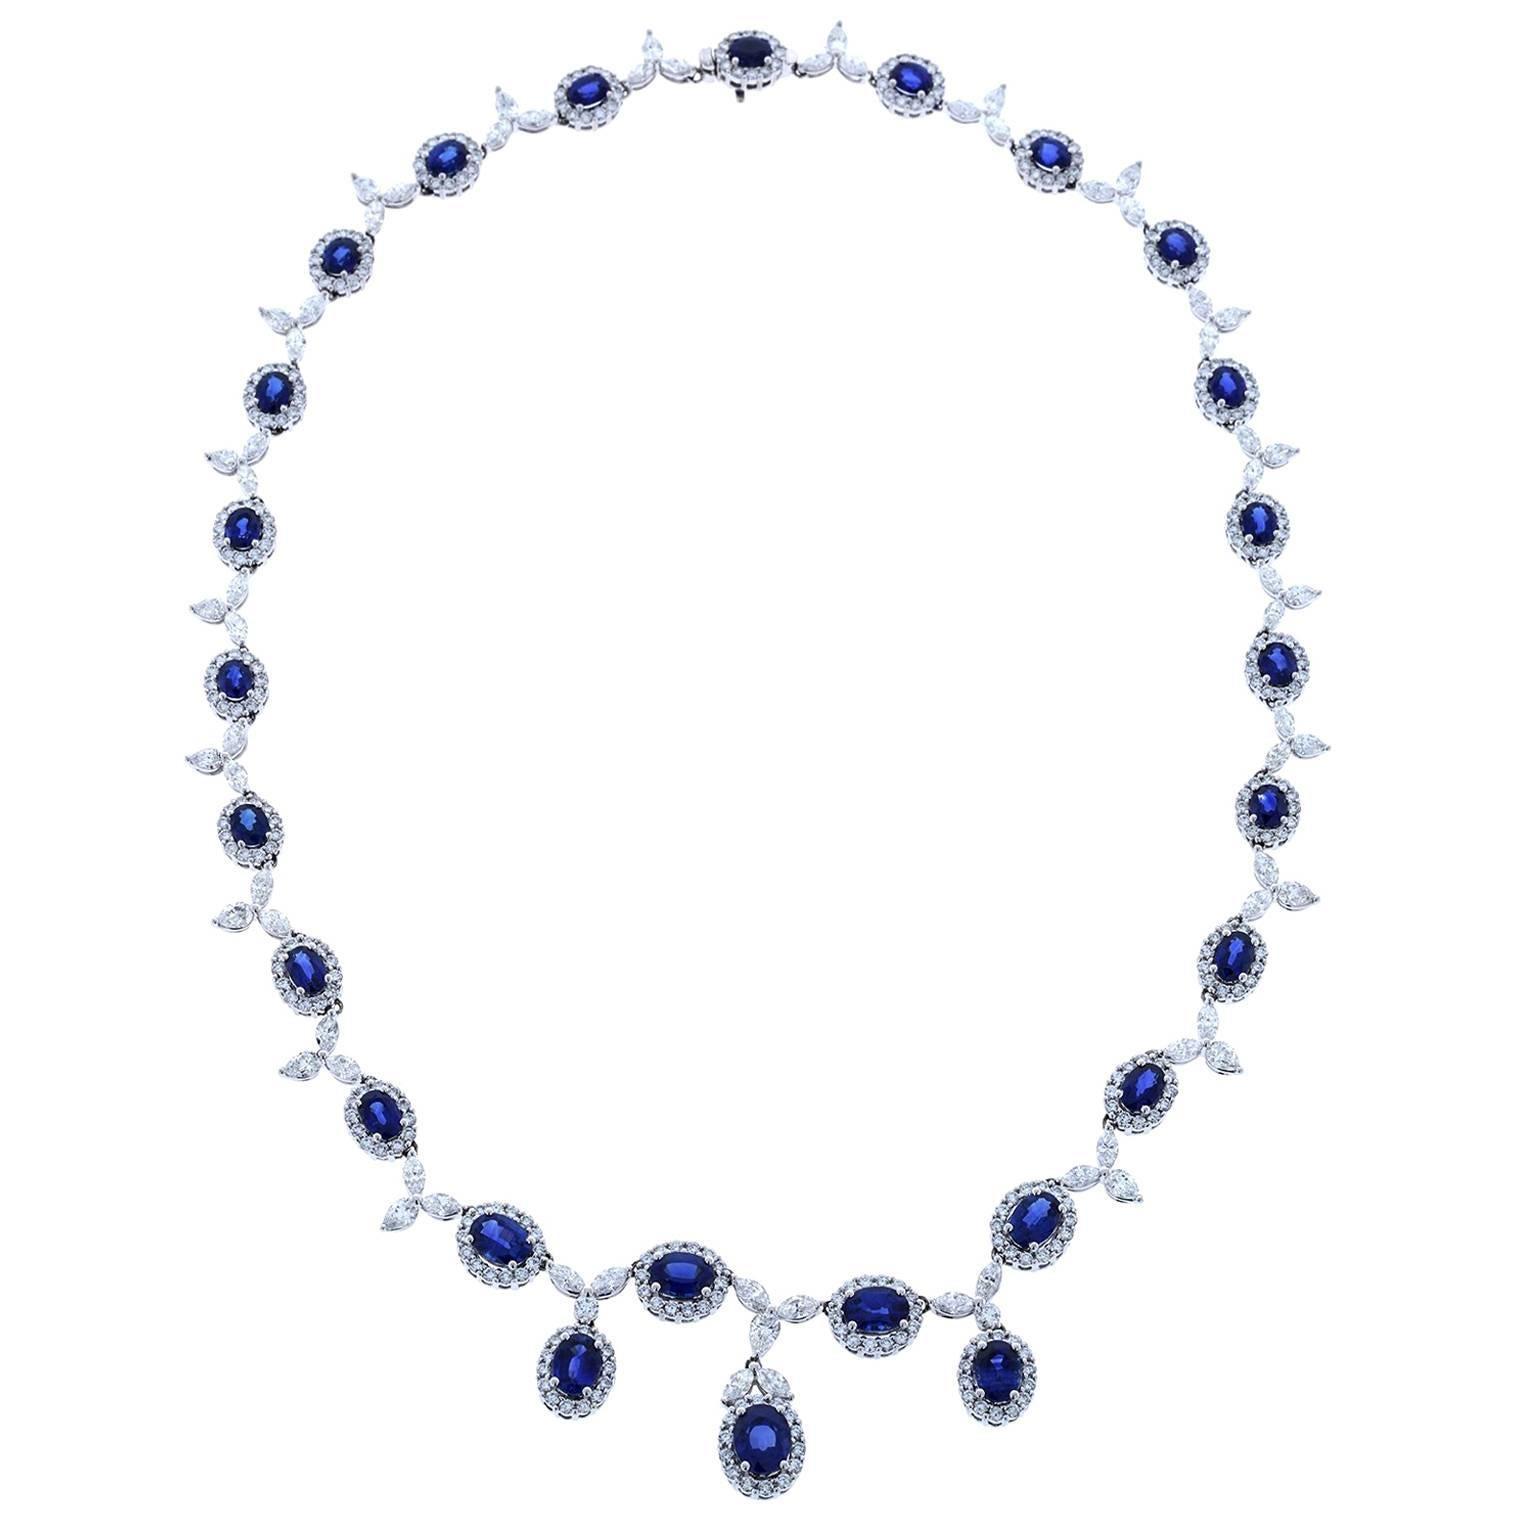 Gregg Ruth 18 Karat White Gold 17.90 Sapphire, 14.40 Total Diamond Necklace